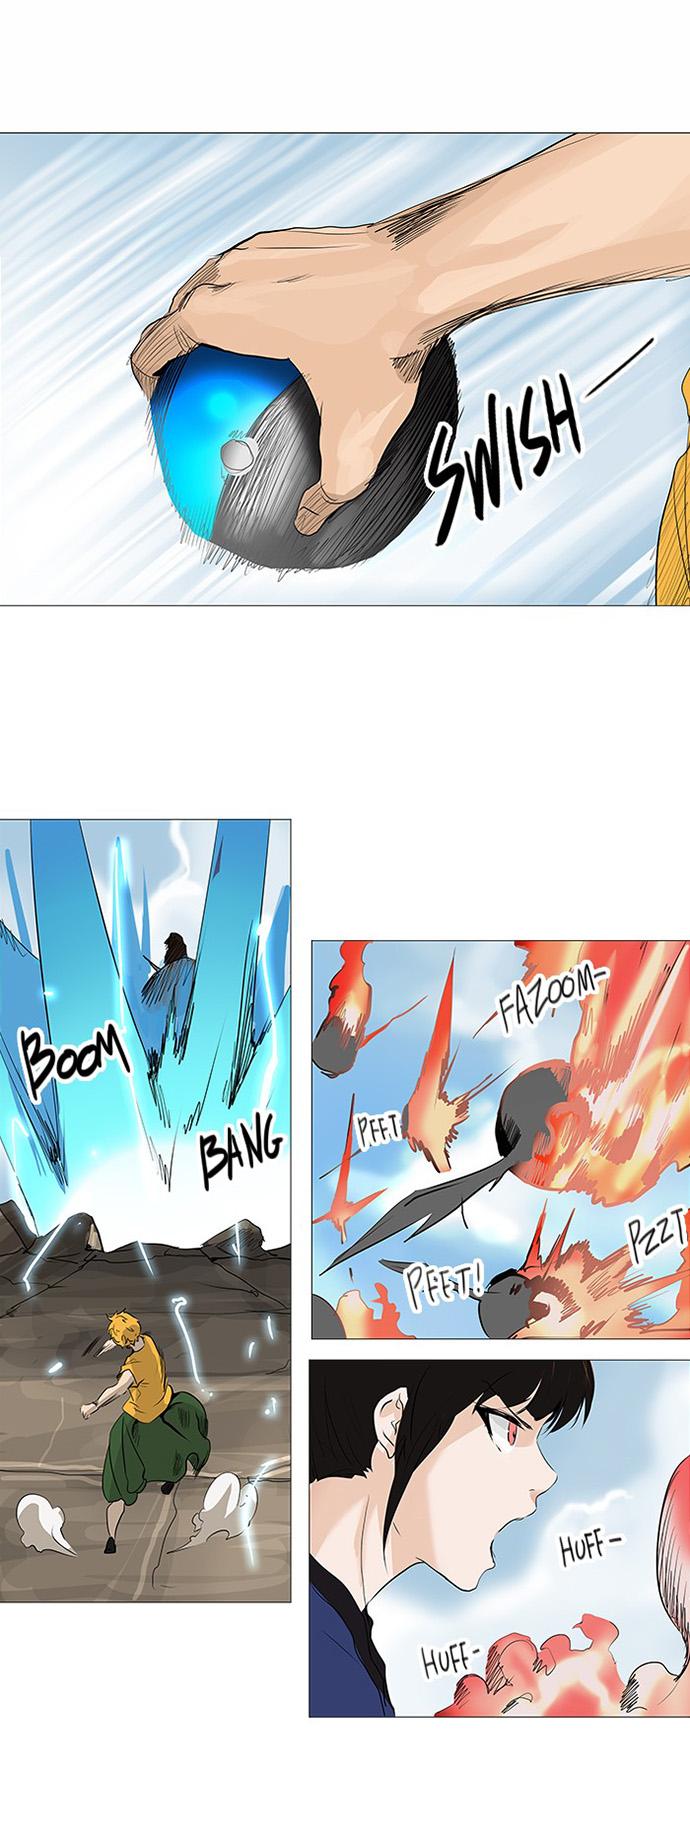 http://c5.ninemanga.com/es_manga/21/149/365457/4cfe33e2fcffb085216defa6daf9a004.jpg Page 7